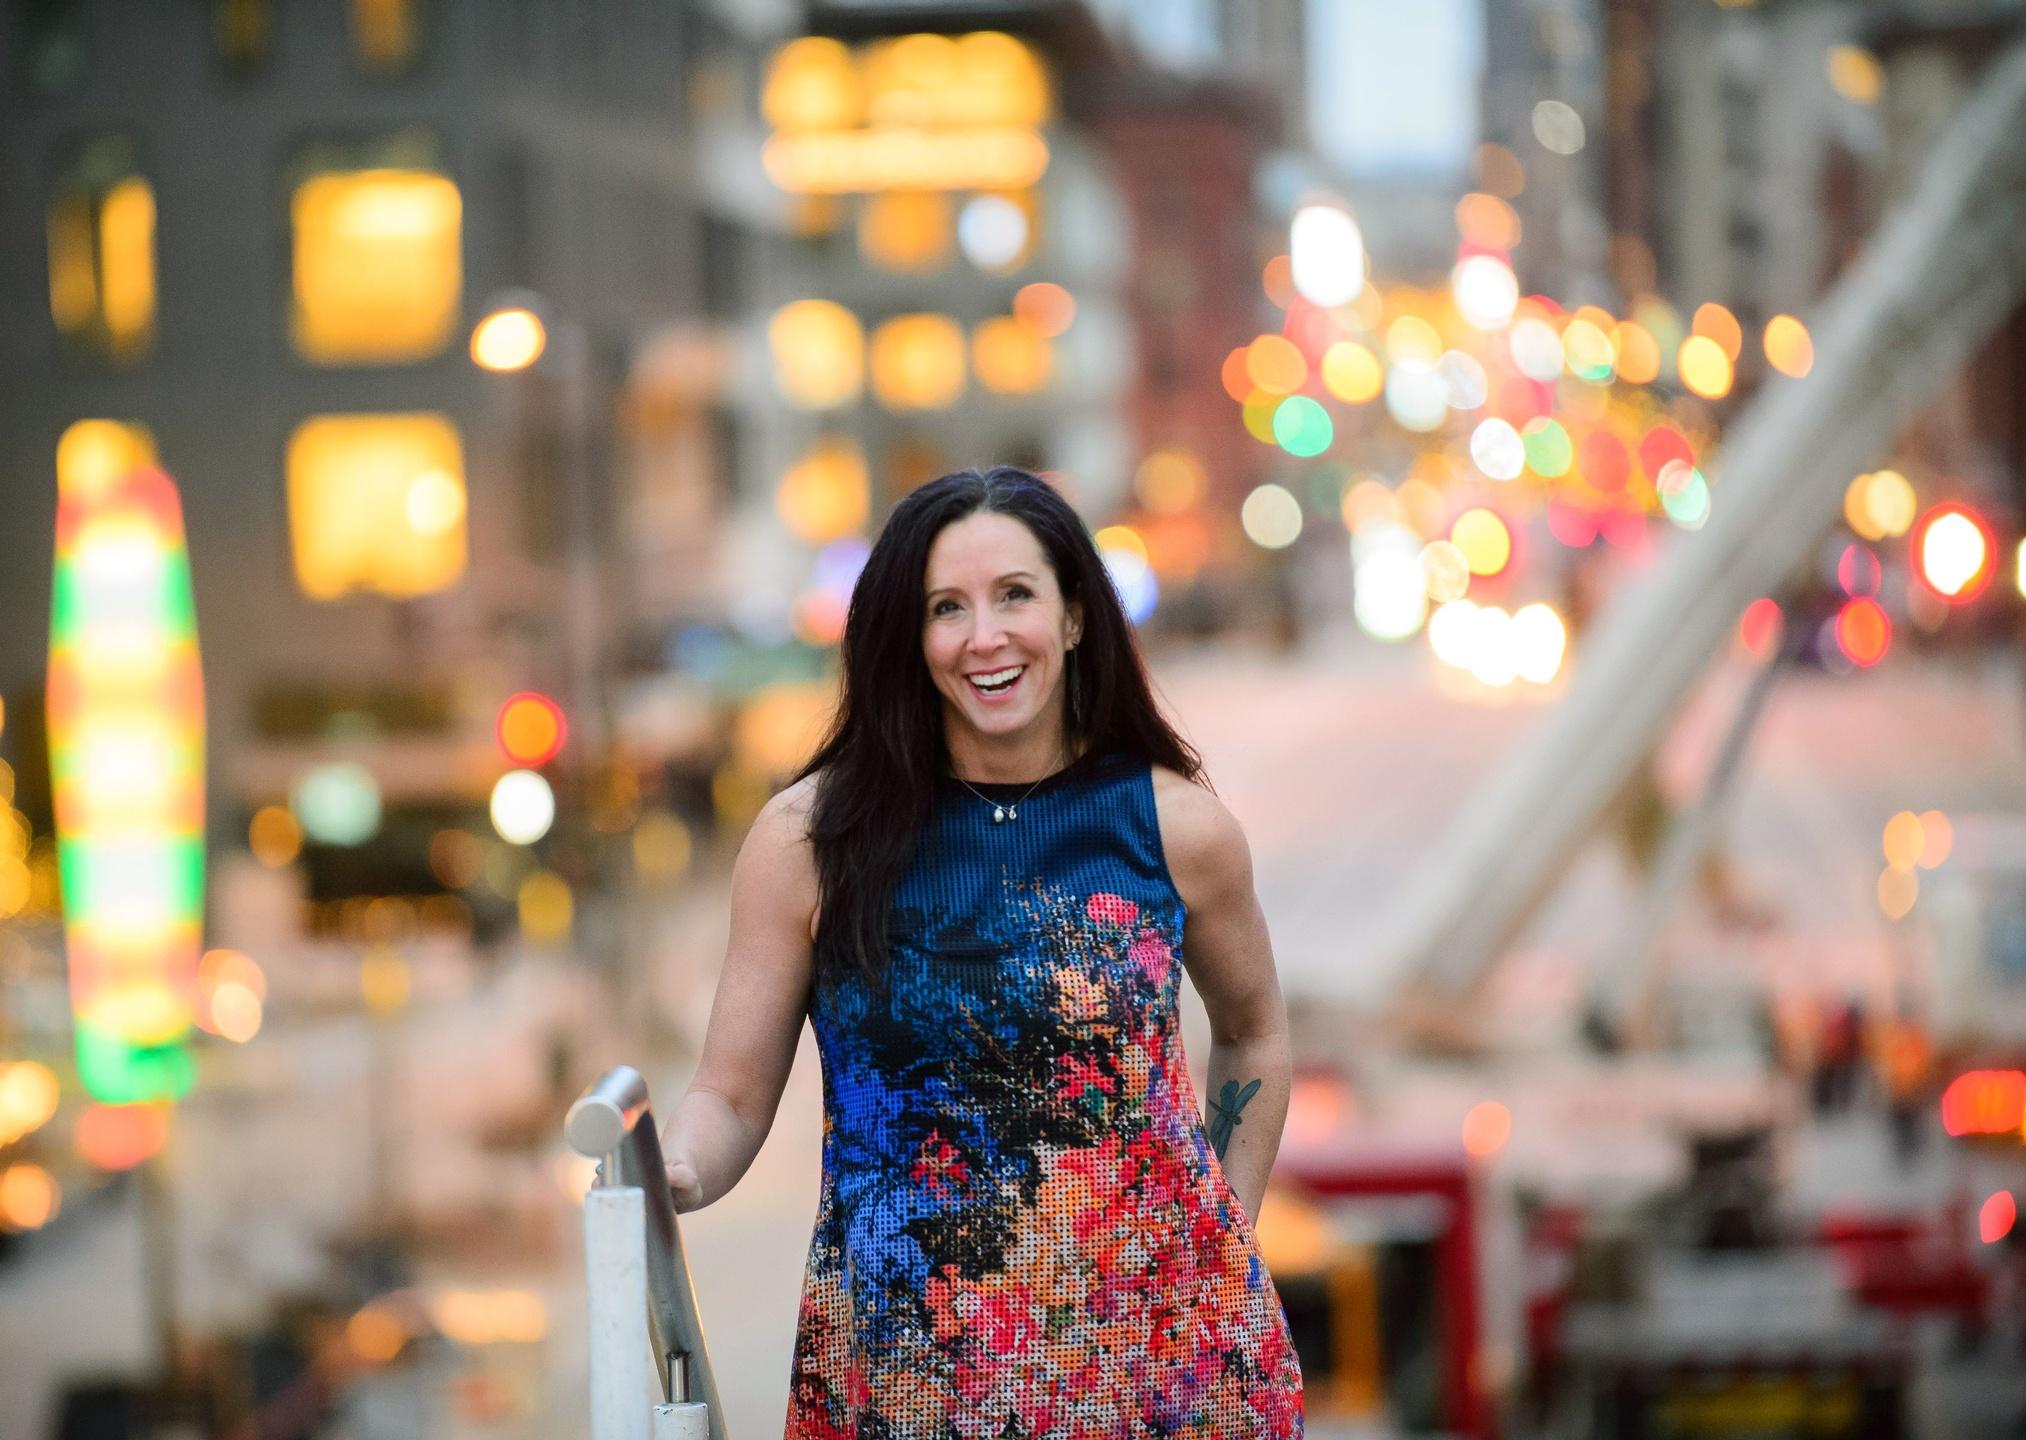 Tamara Ghandour - Everyday Innovators founder